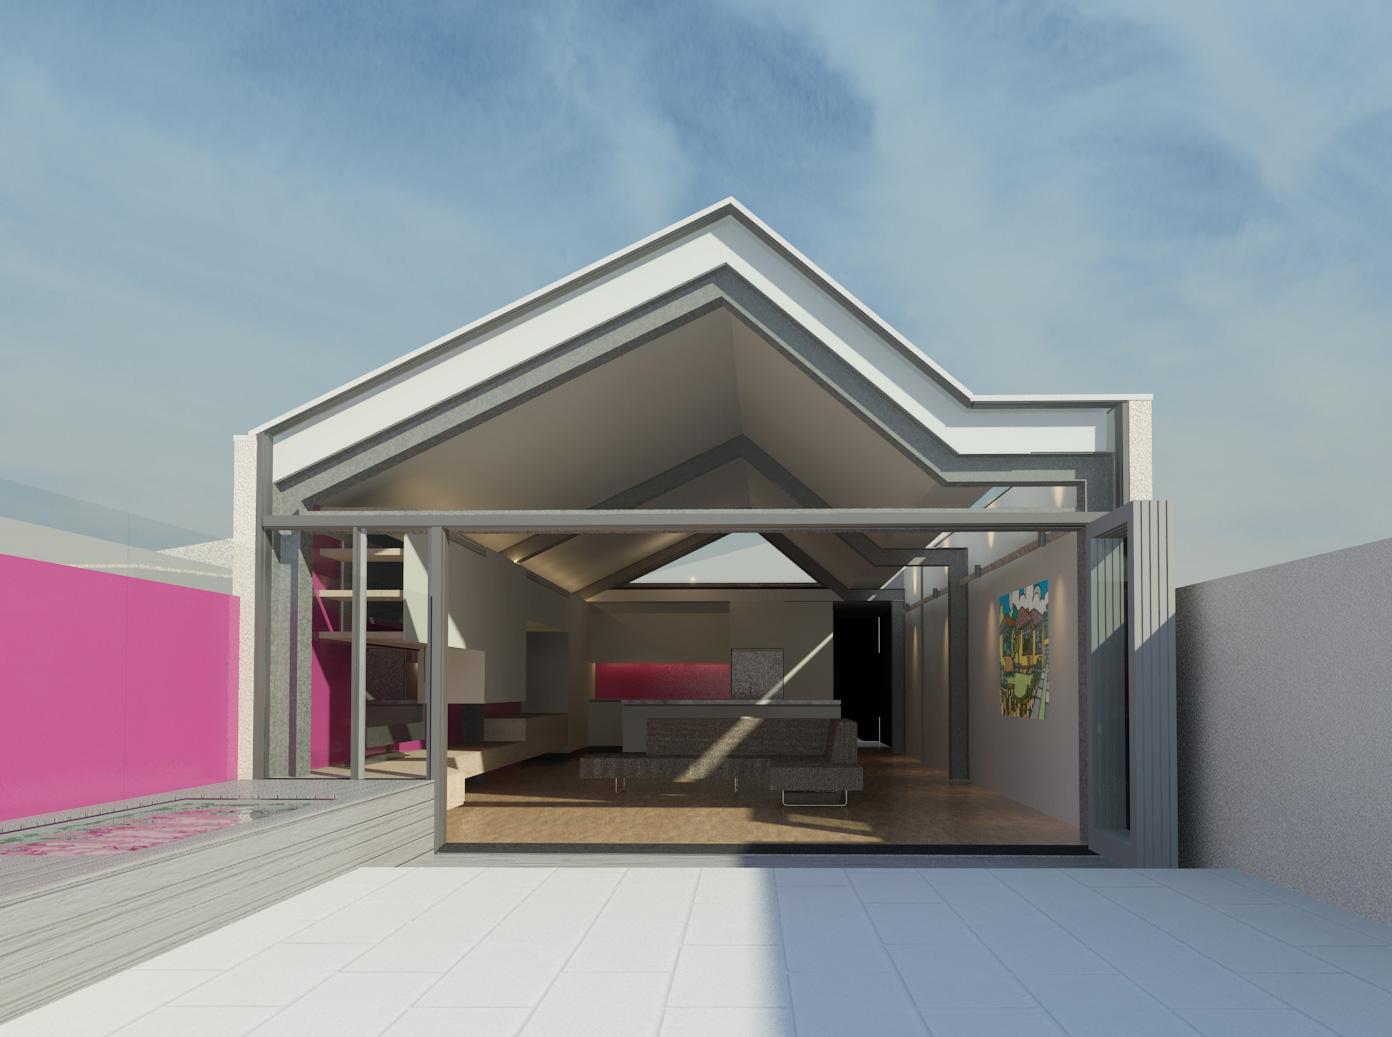 brunswick-house-design-by-warc-studio-01.jpg